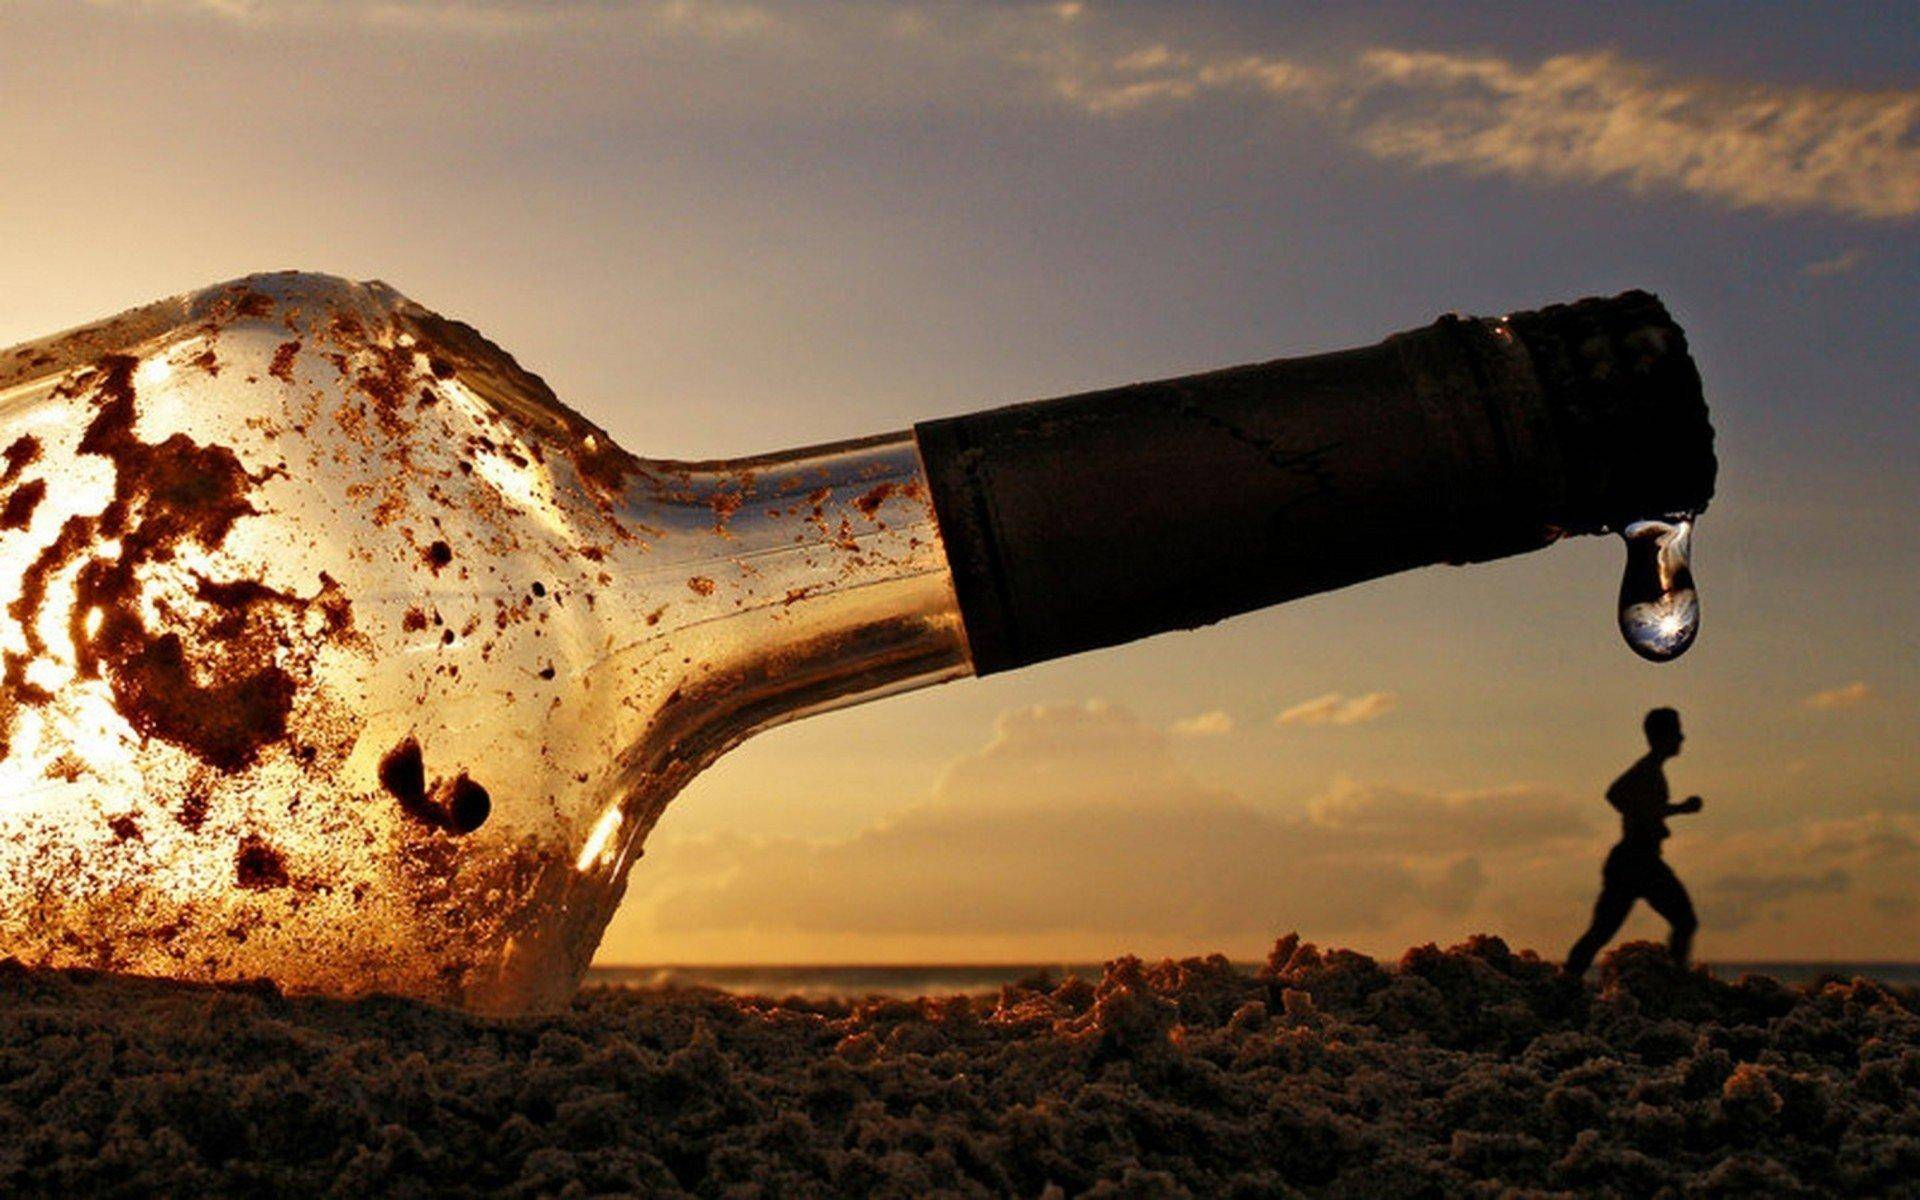 Негативное влияние никотина и алкоголя на человека